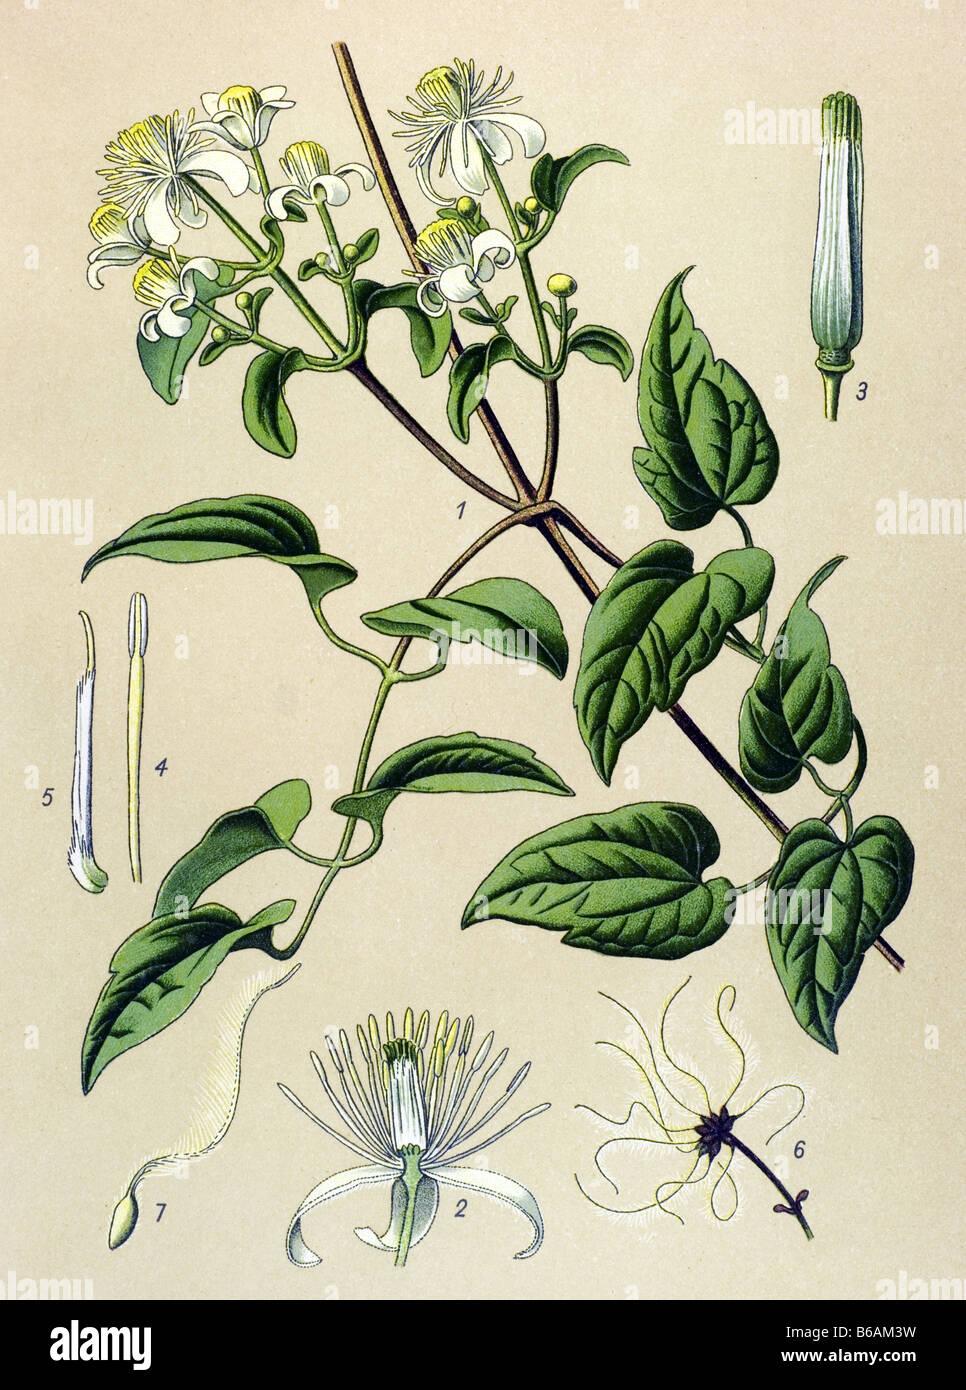 Old man's beard, Clematis vitalba, poisonous plants illustrations - Stock Image